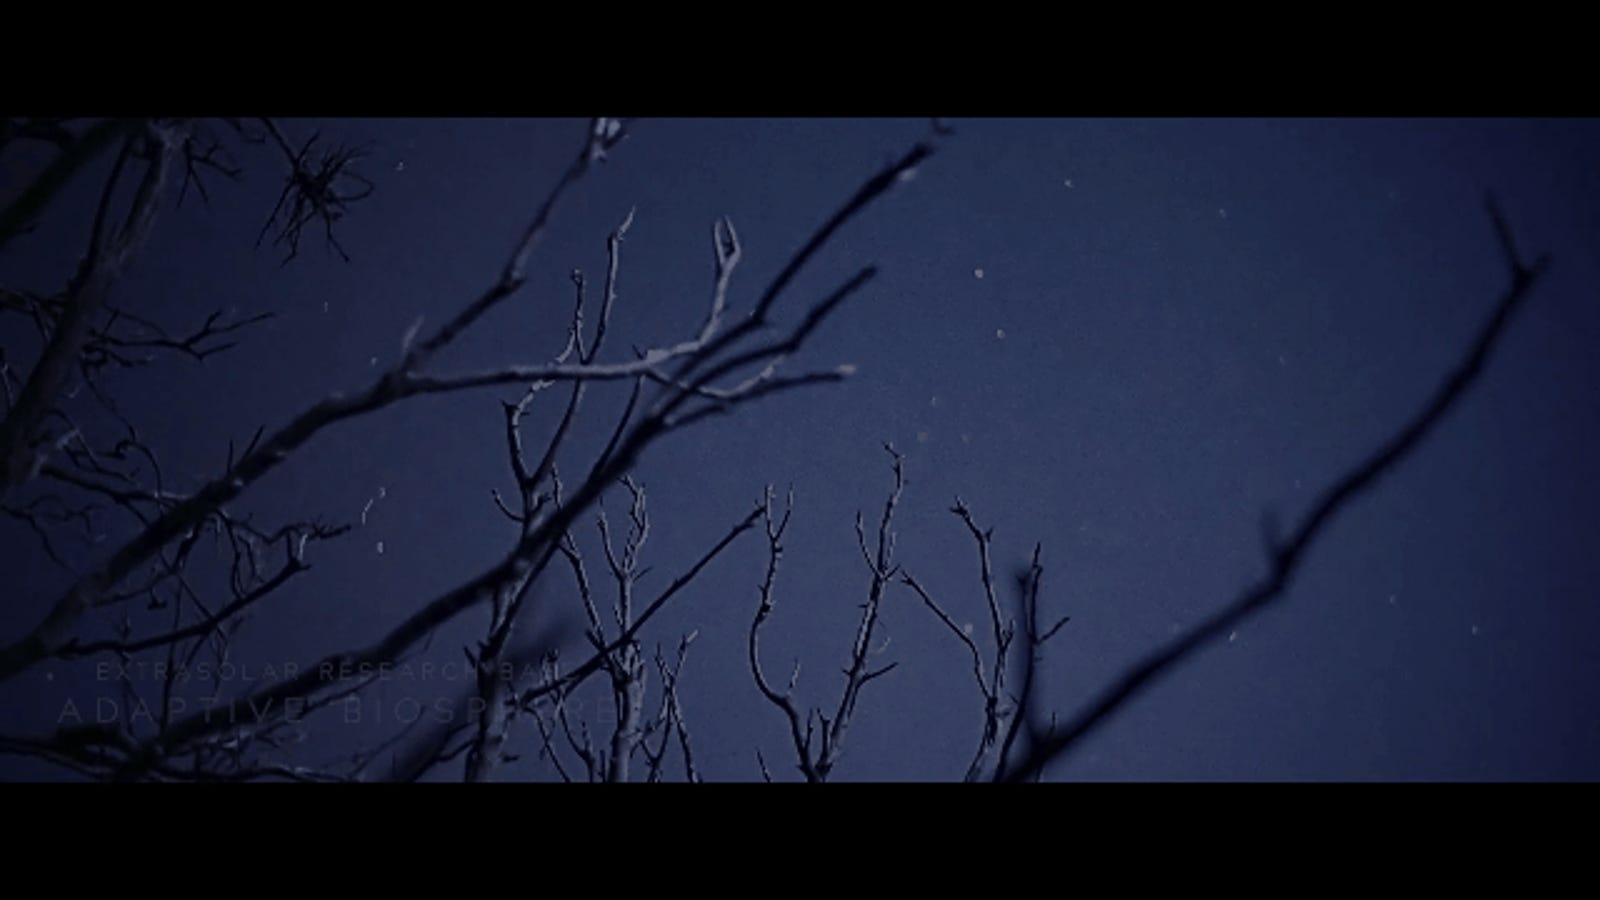 Intense Scifi Film Shot Entirely in Moonlight Looks Completely Alien